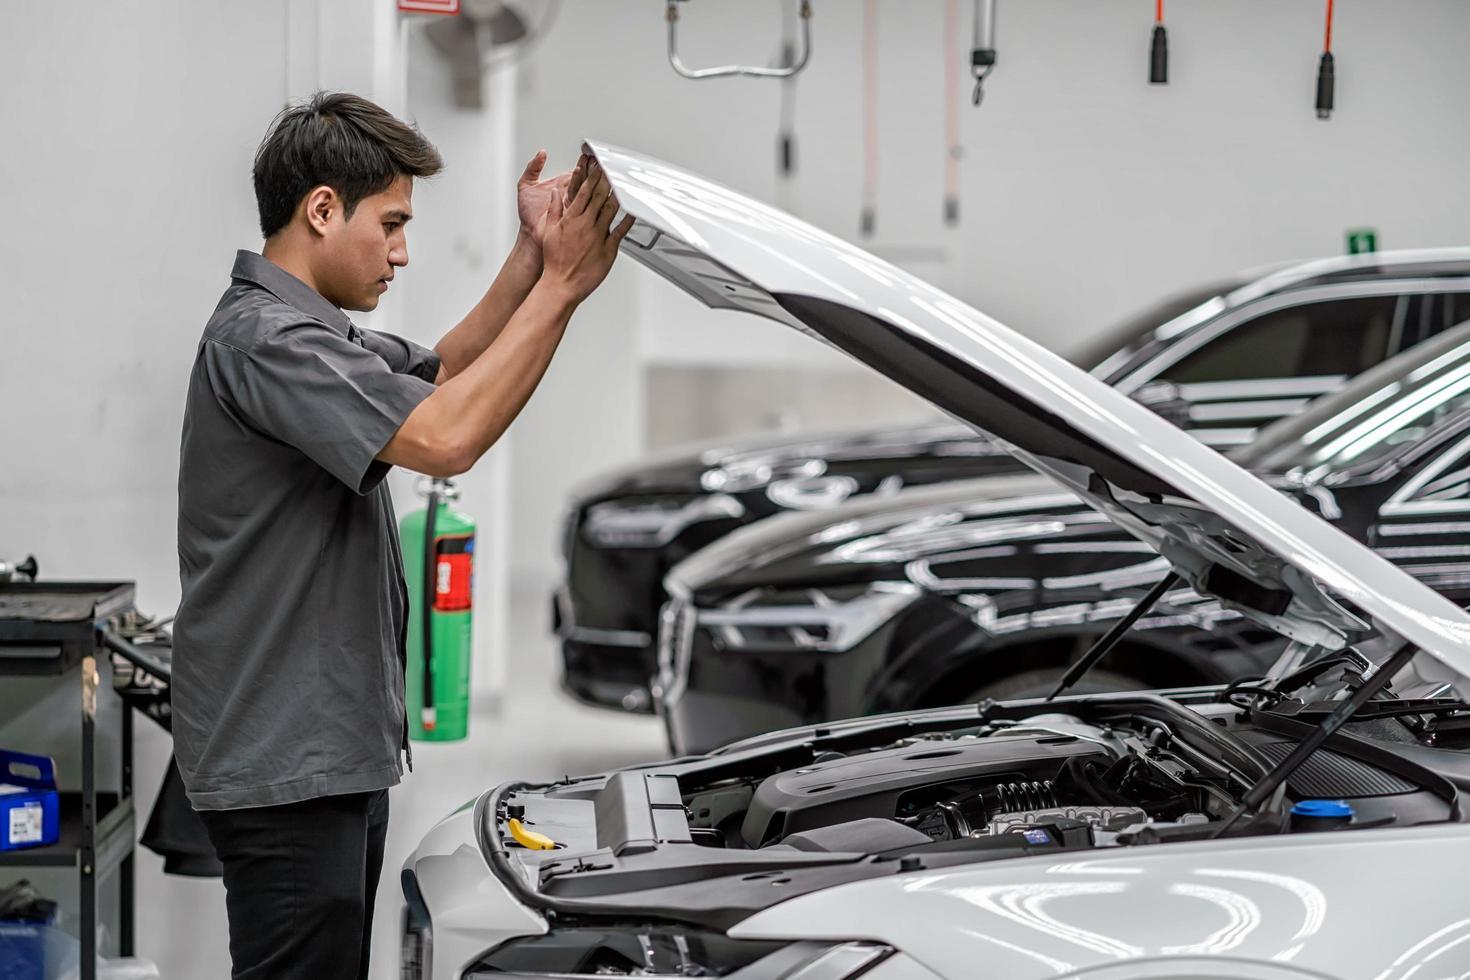 en mekaniker tittar under huven på en kunds bil i servicecenter foto